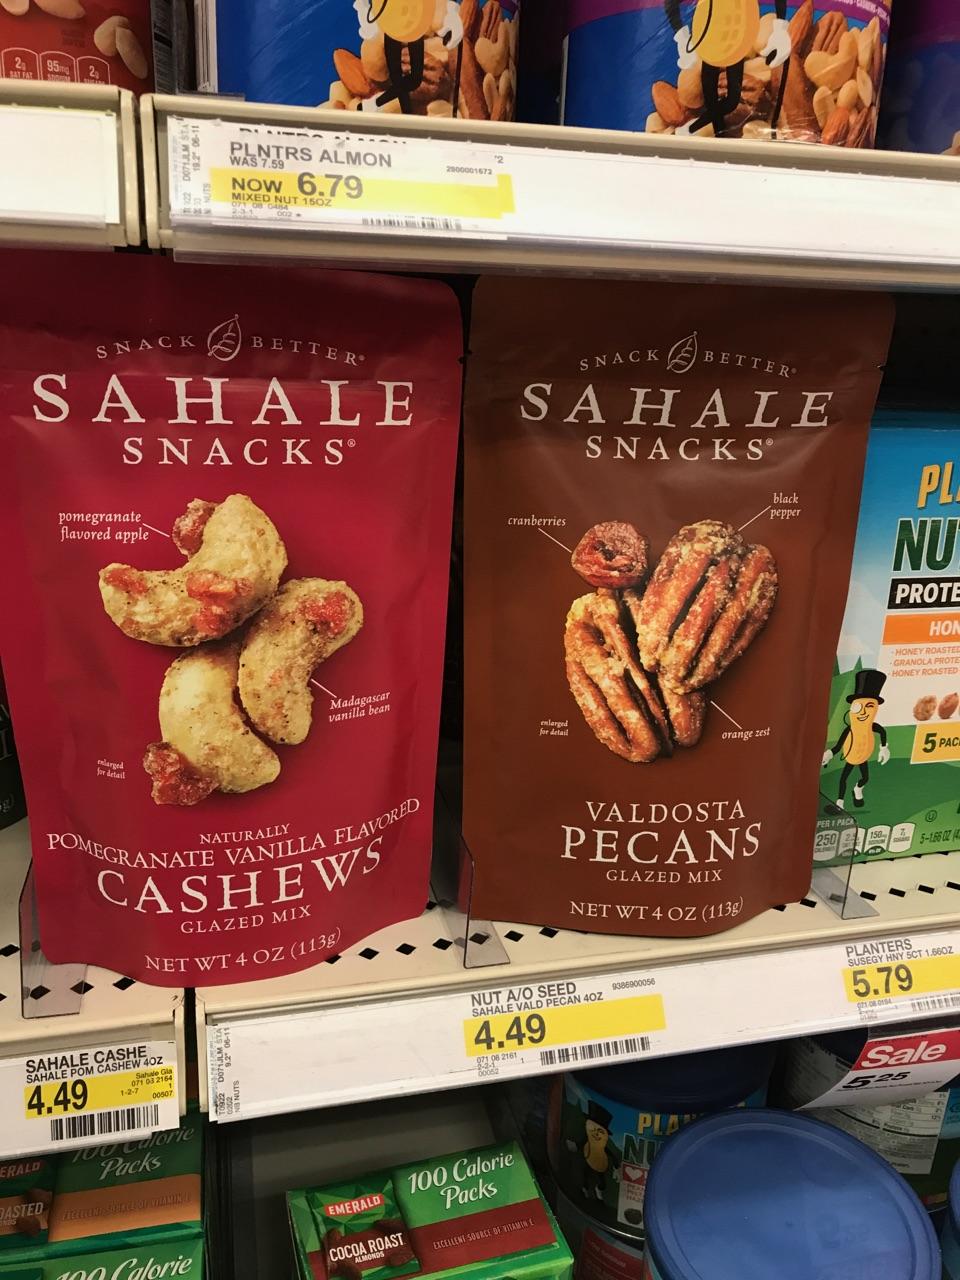 Sahale Snacks at Target